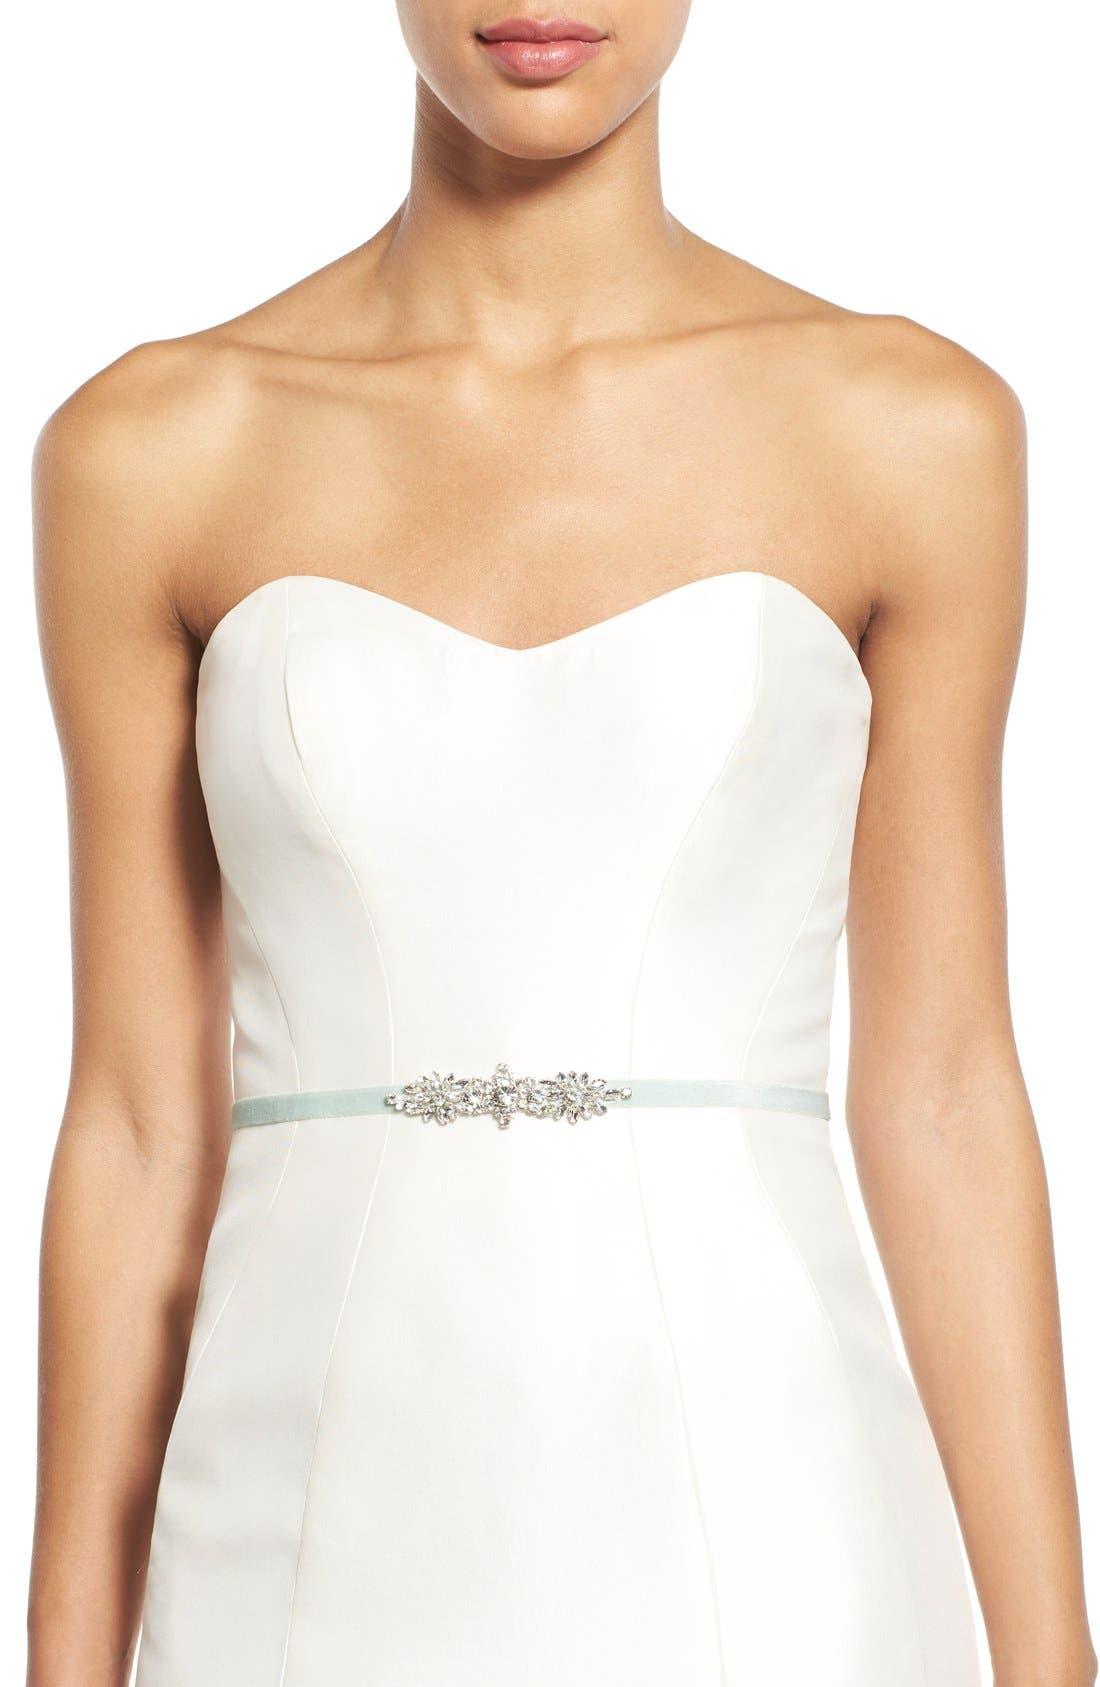 Bow Wedding Dress Sash with Crystals